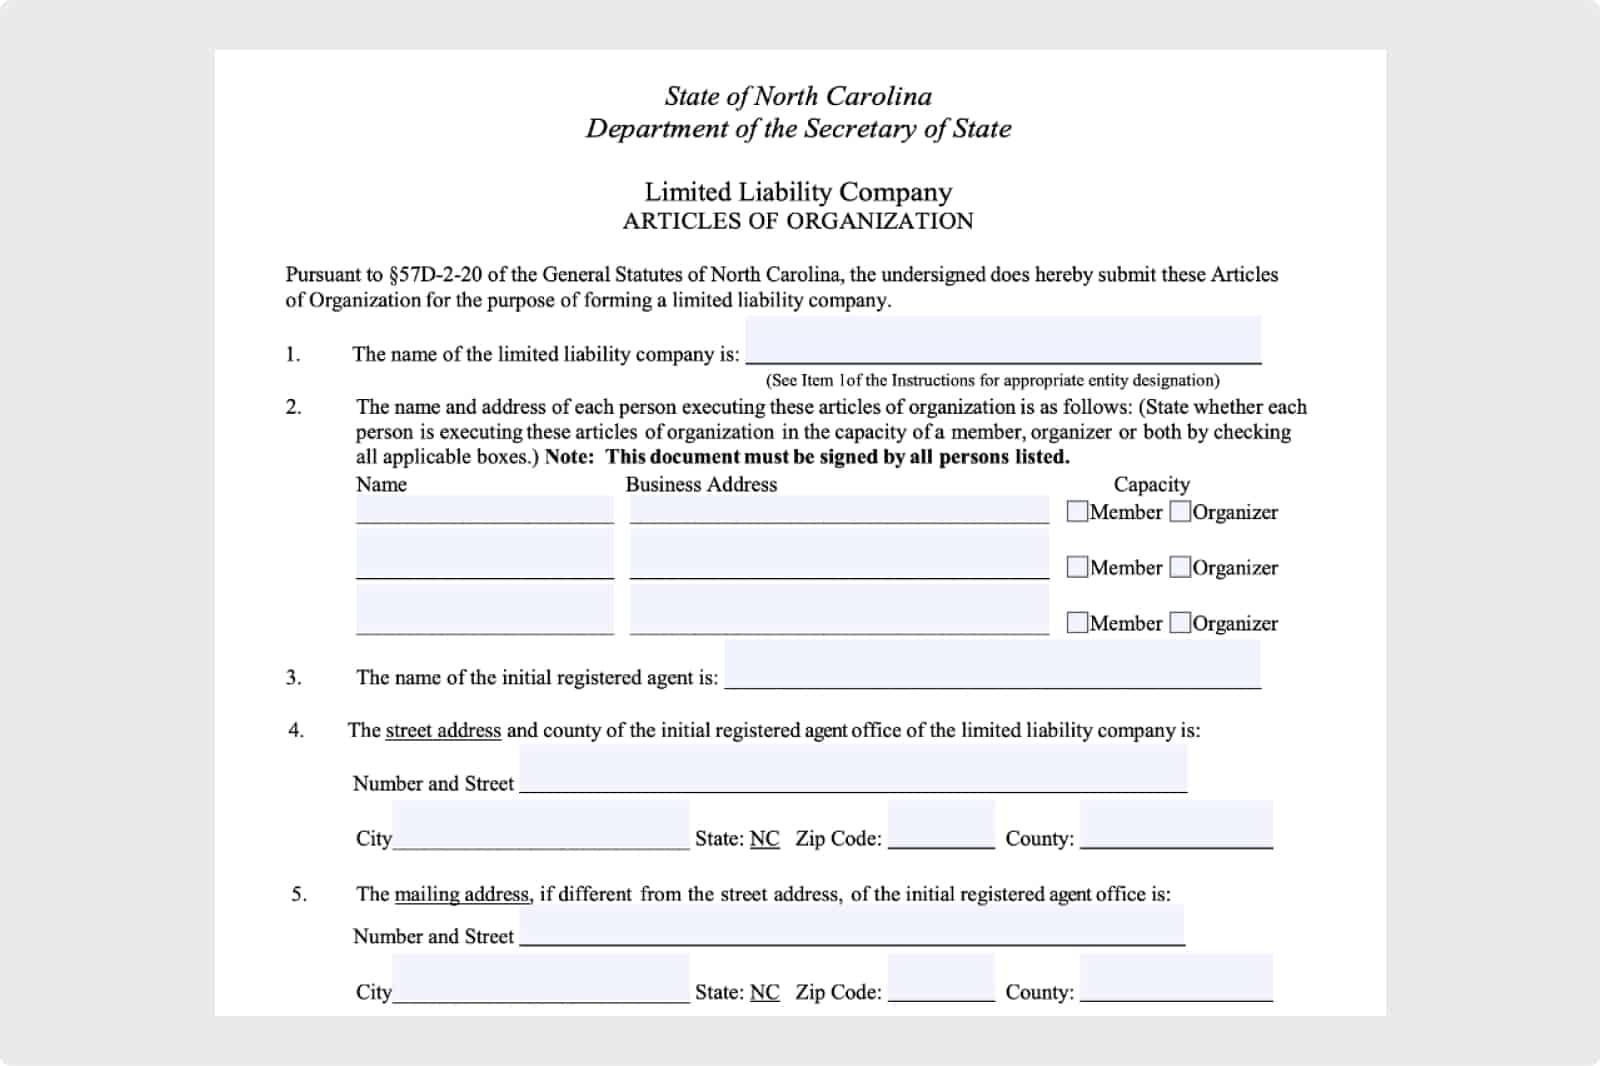 Article of Organization Form in North Carolina